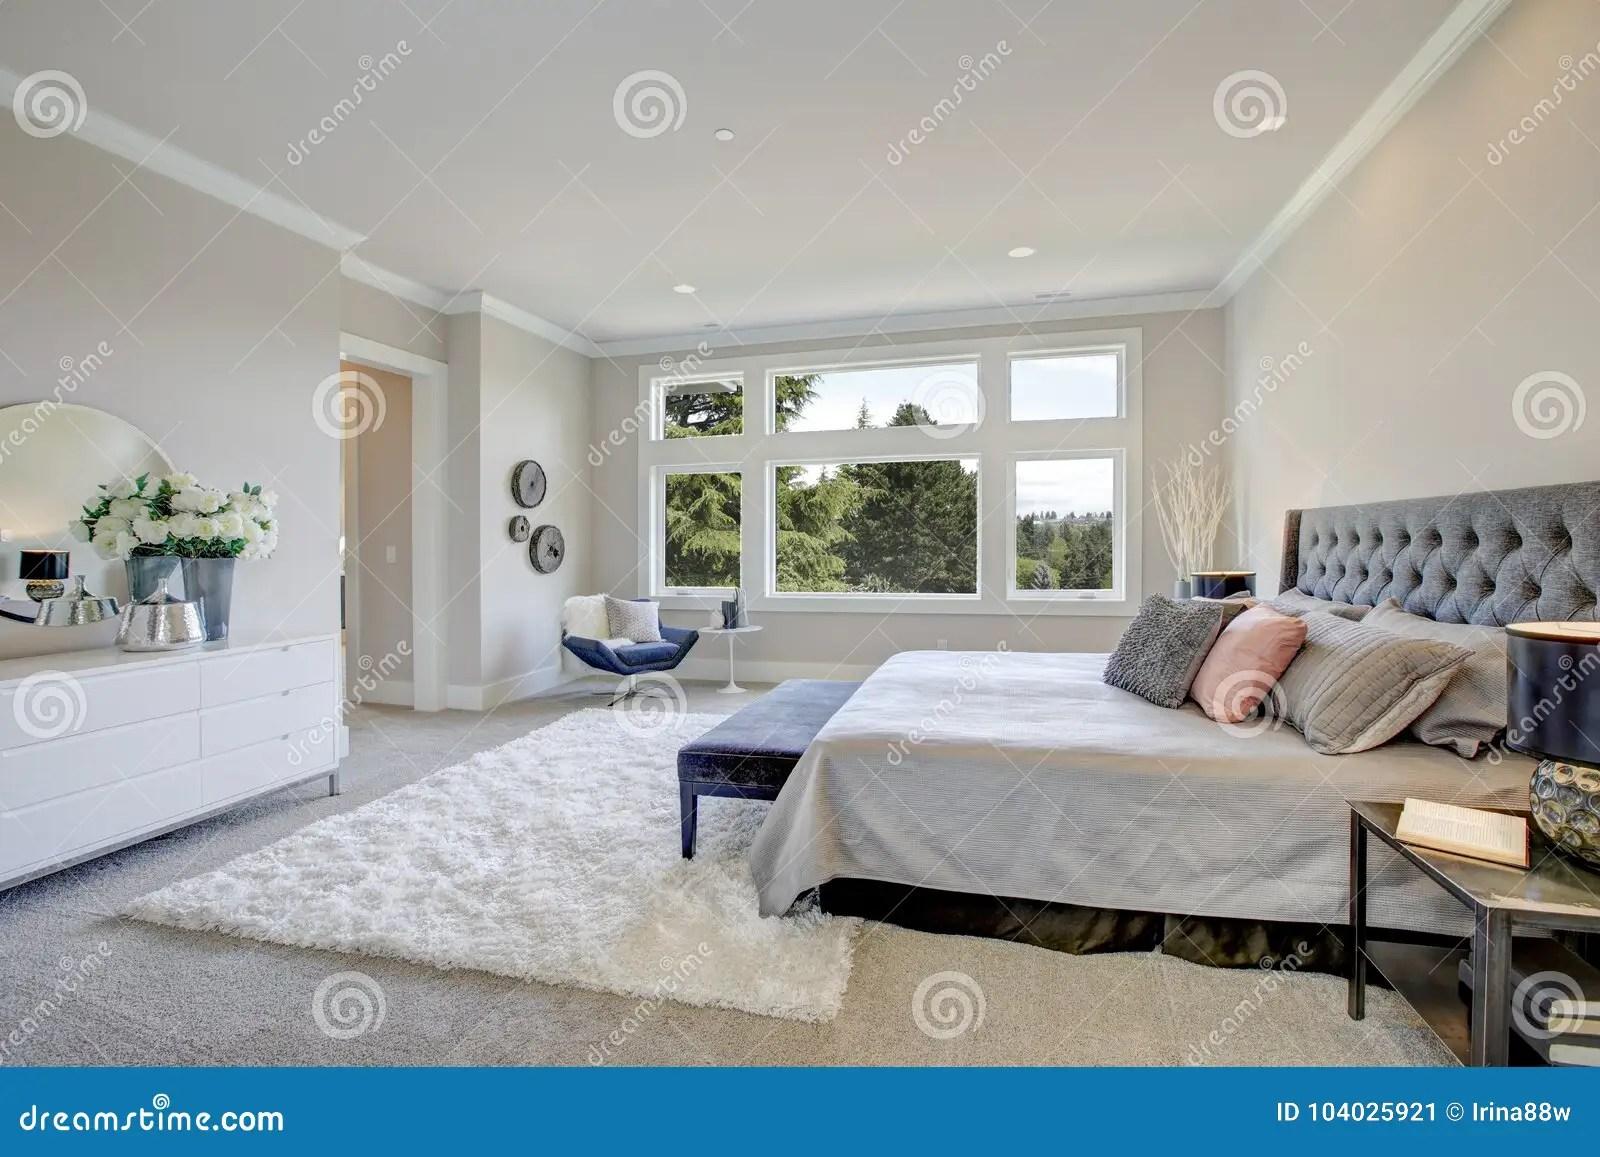 https www dreamstime com master bedroom interior king size bed light filled boasts tufted headboard dressed grey bedding facing large white image104025921